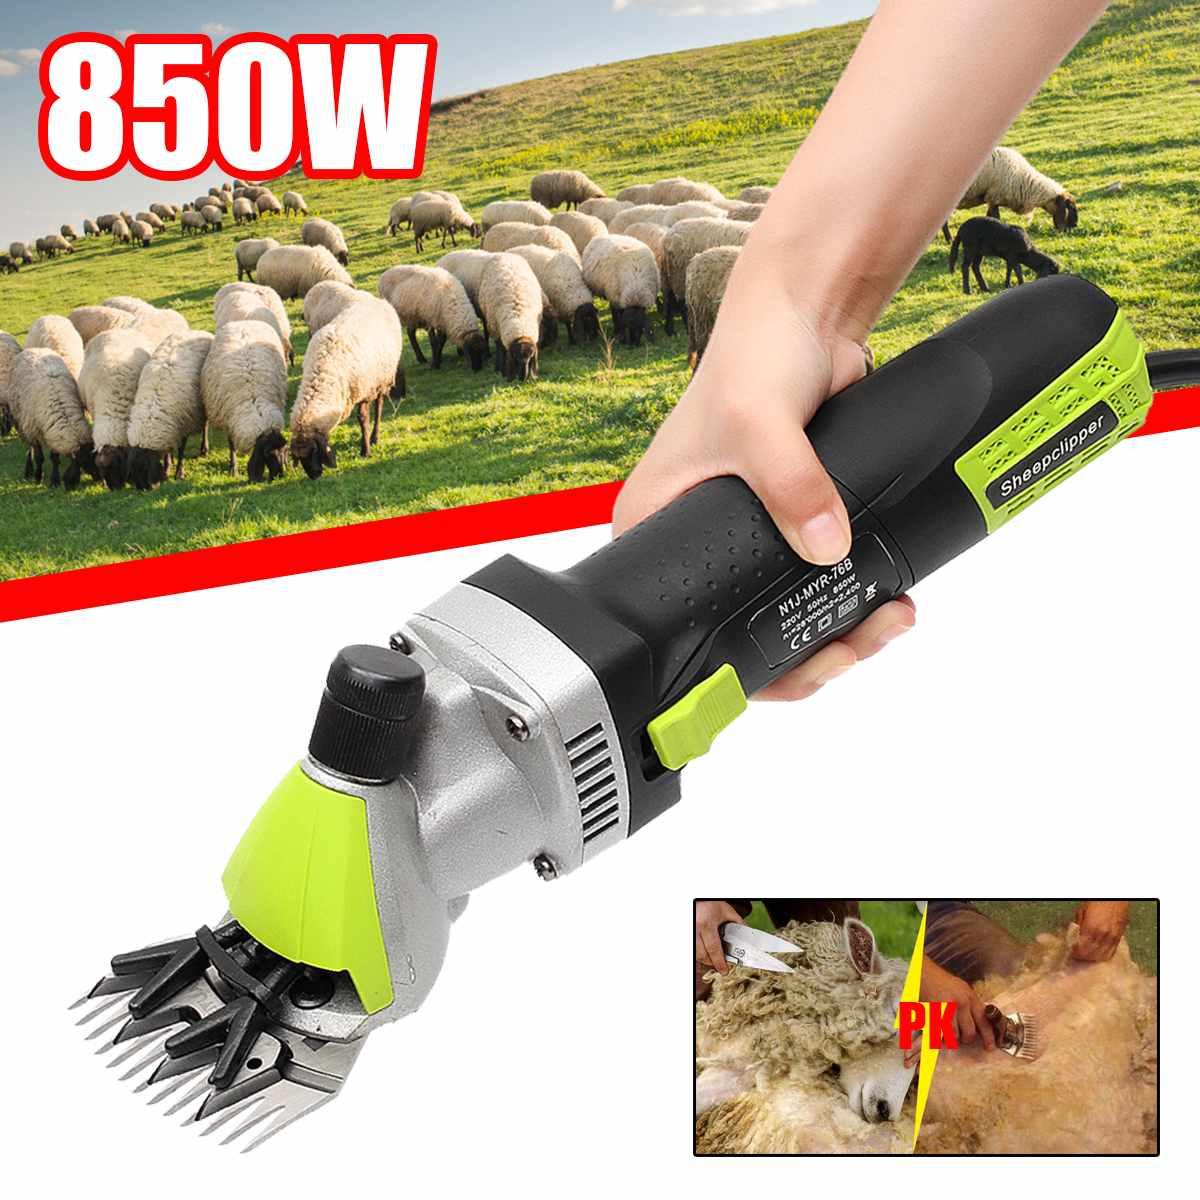 Electric Sheep Goats Shearing Clipper Animal Trimmer Tool Farm Pet Dog Hair Shearing Machine Cutter Wool Scissor 850W 220V